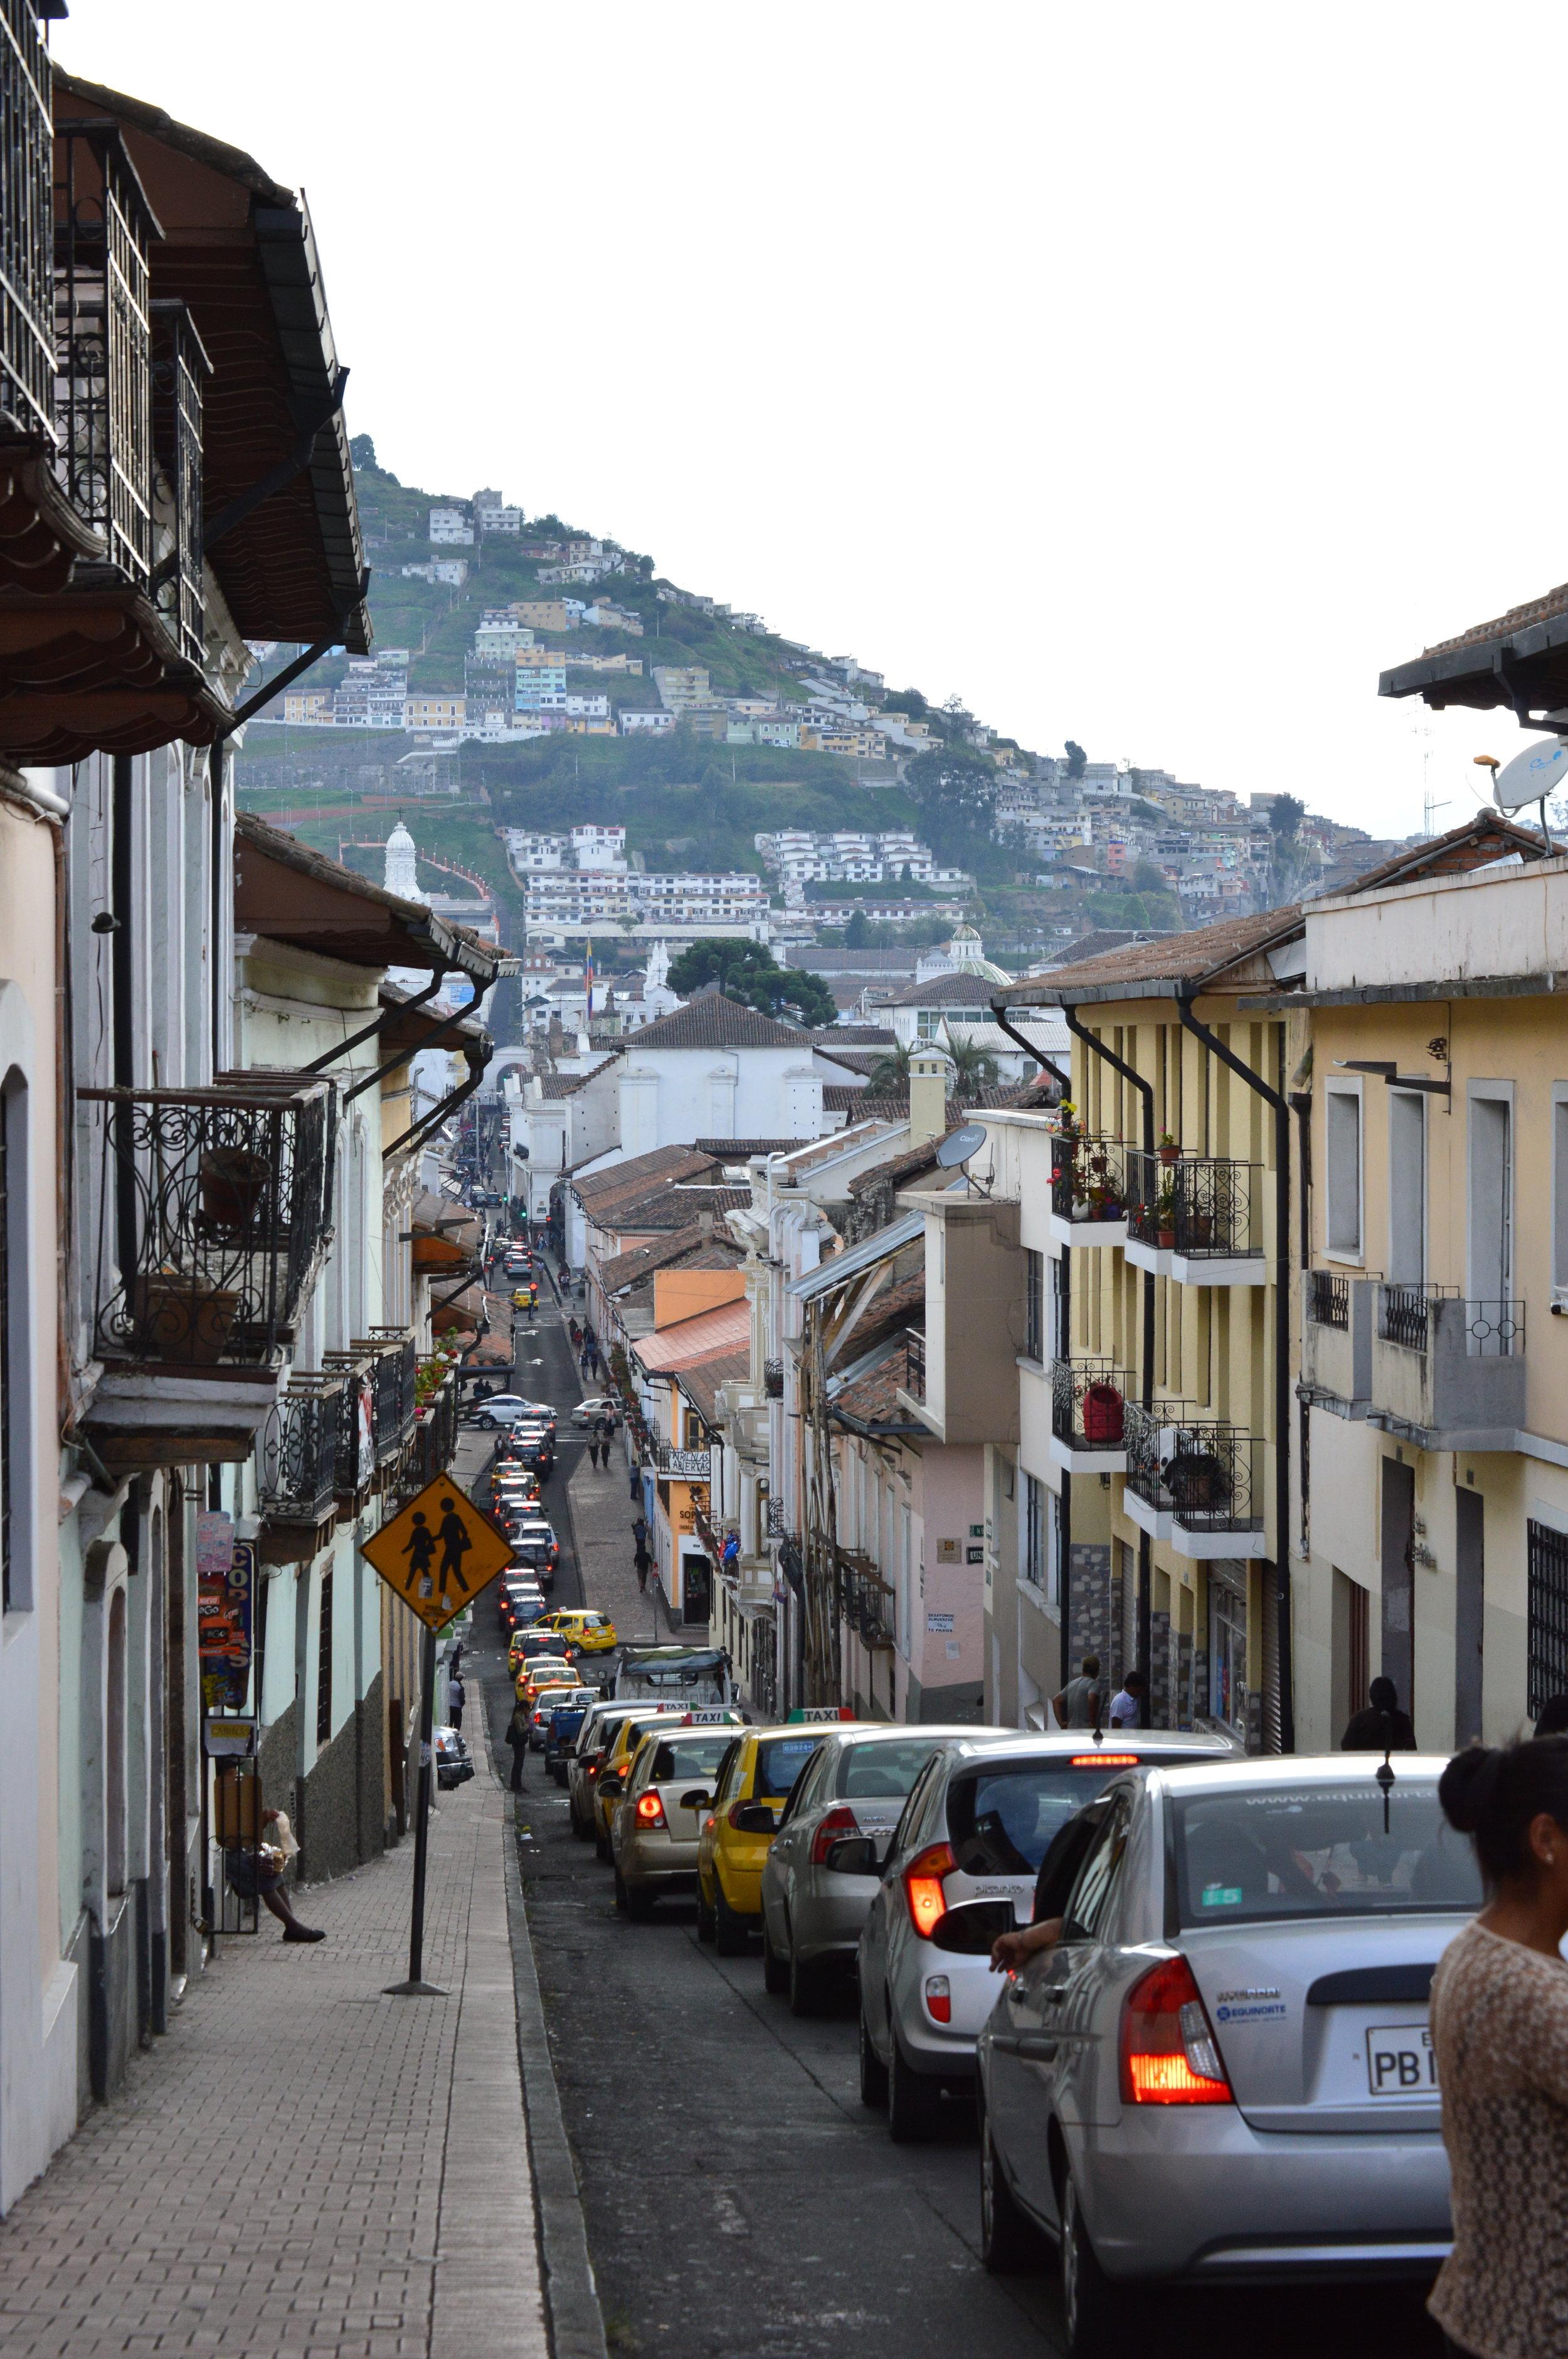 Rush hour in Quito